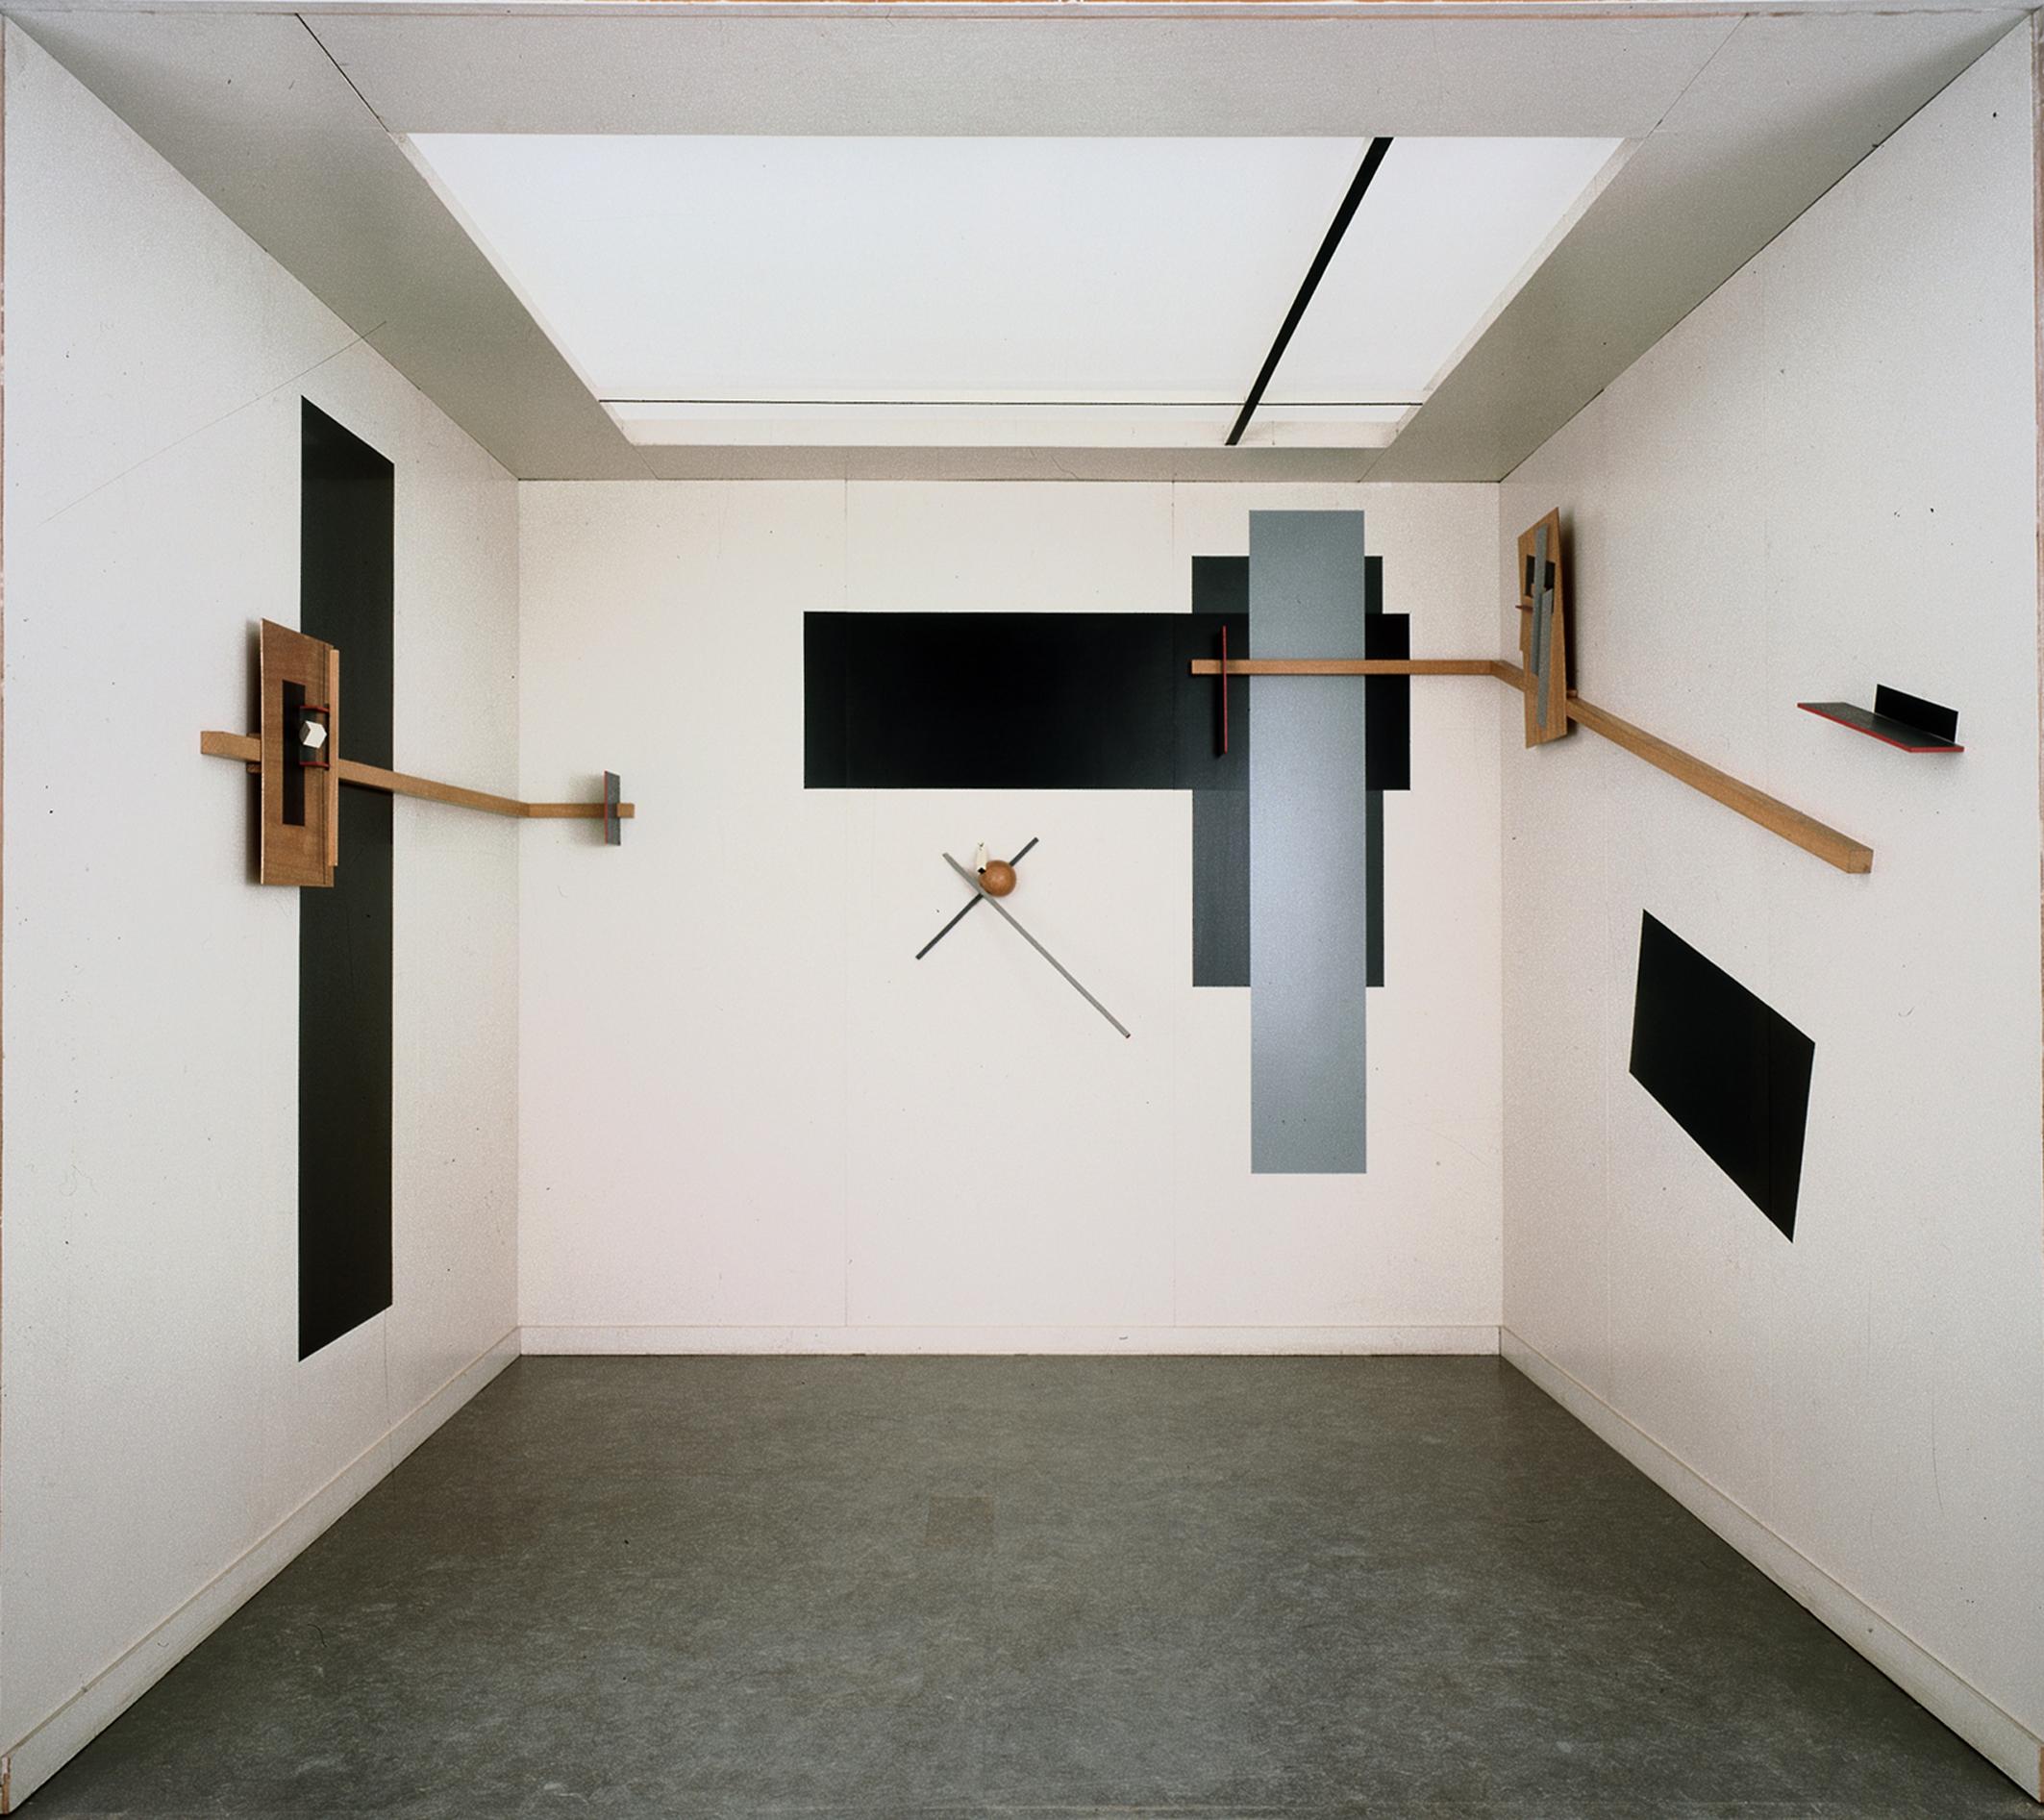 el-lissitzky_prounroom_1923_0.jpg